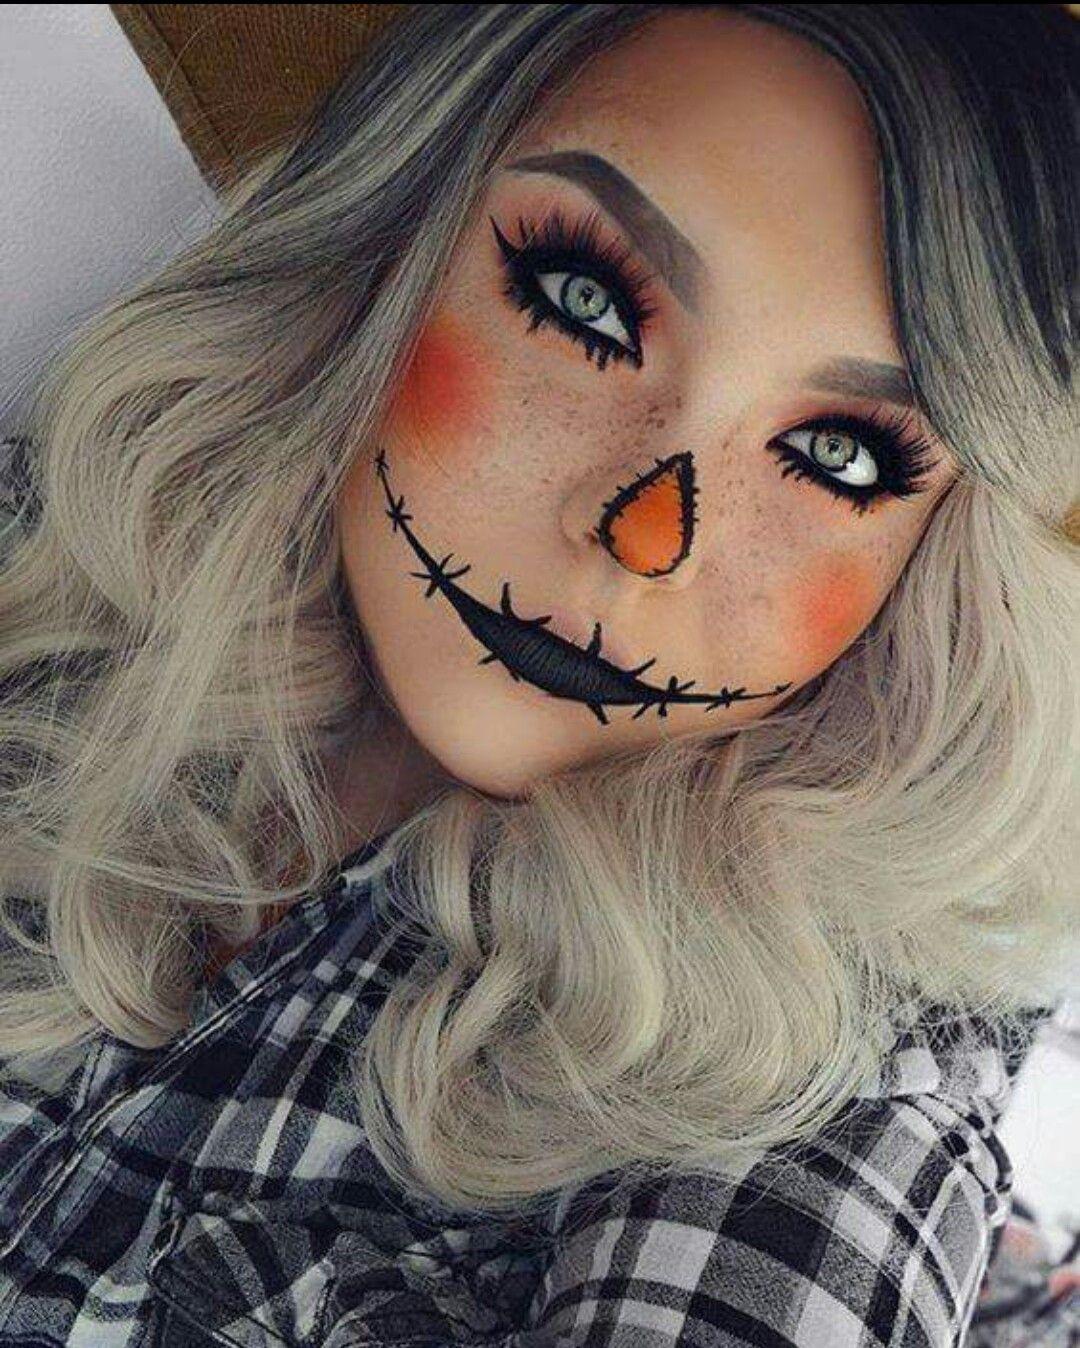 Pin de Cris Jiher en Makeup Costume (con imágenes